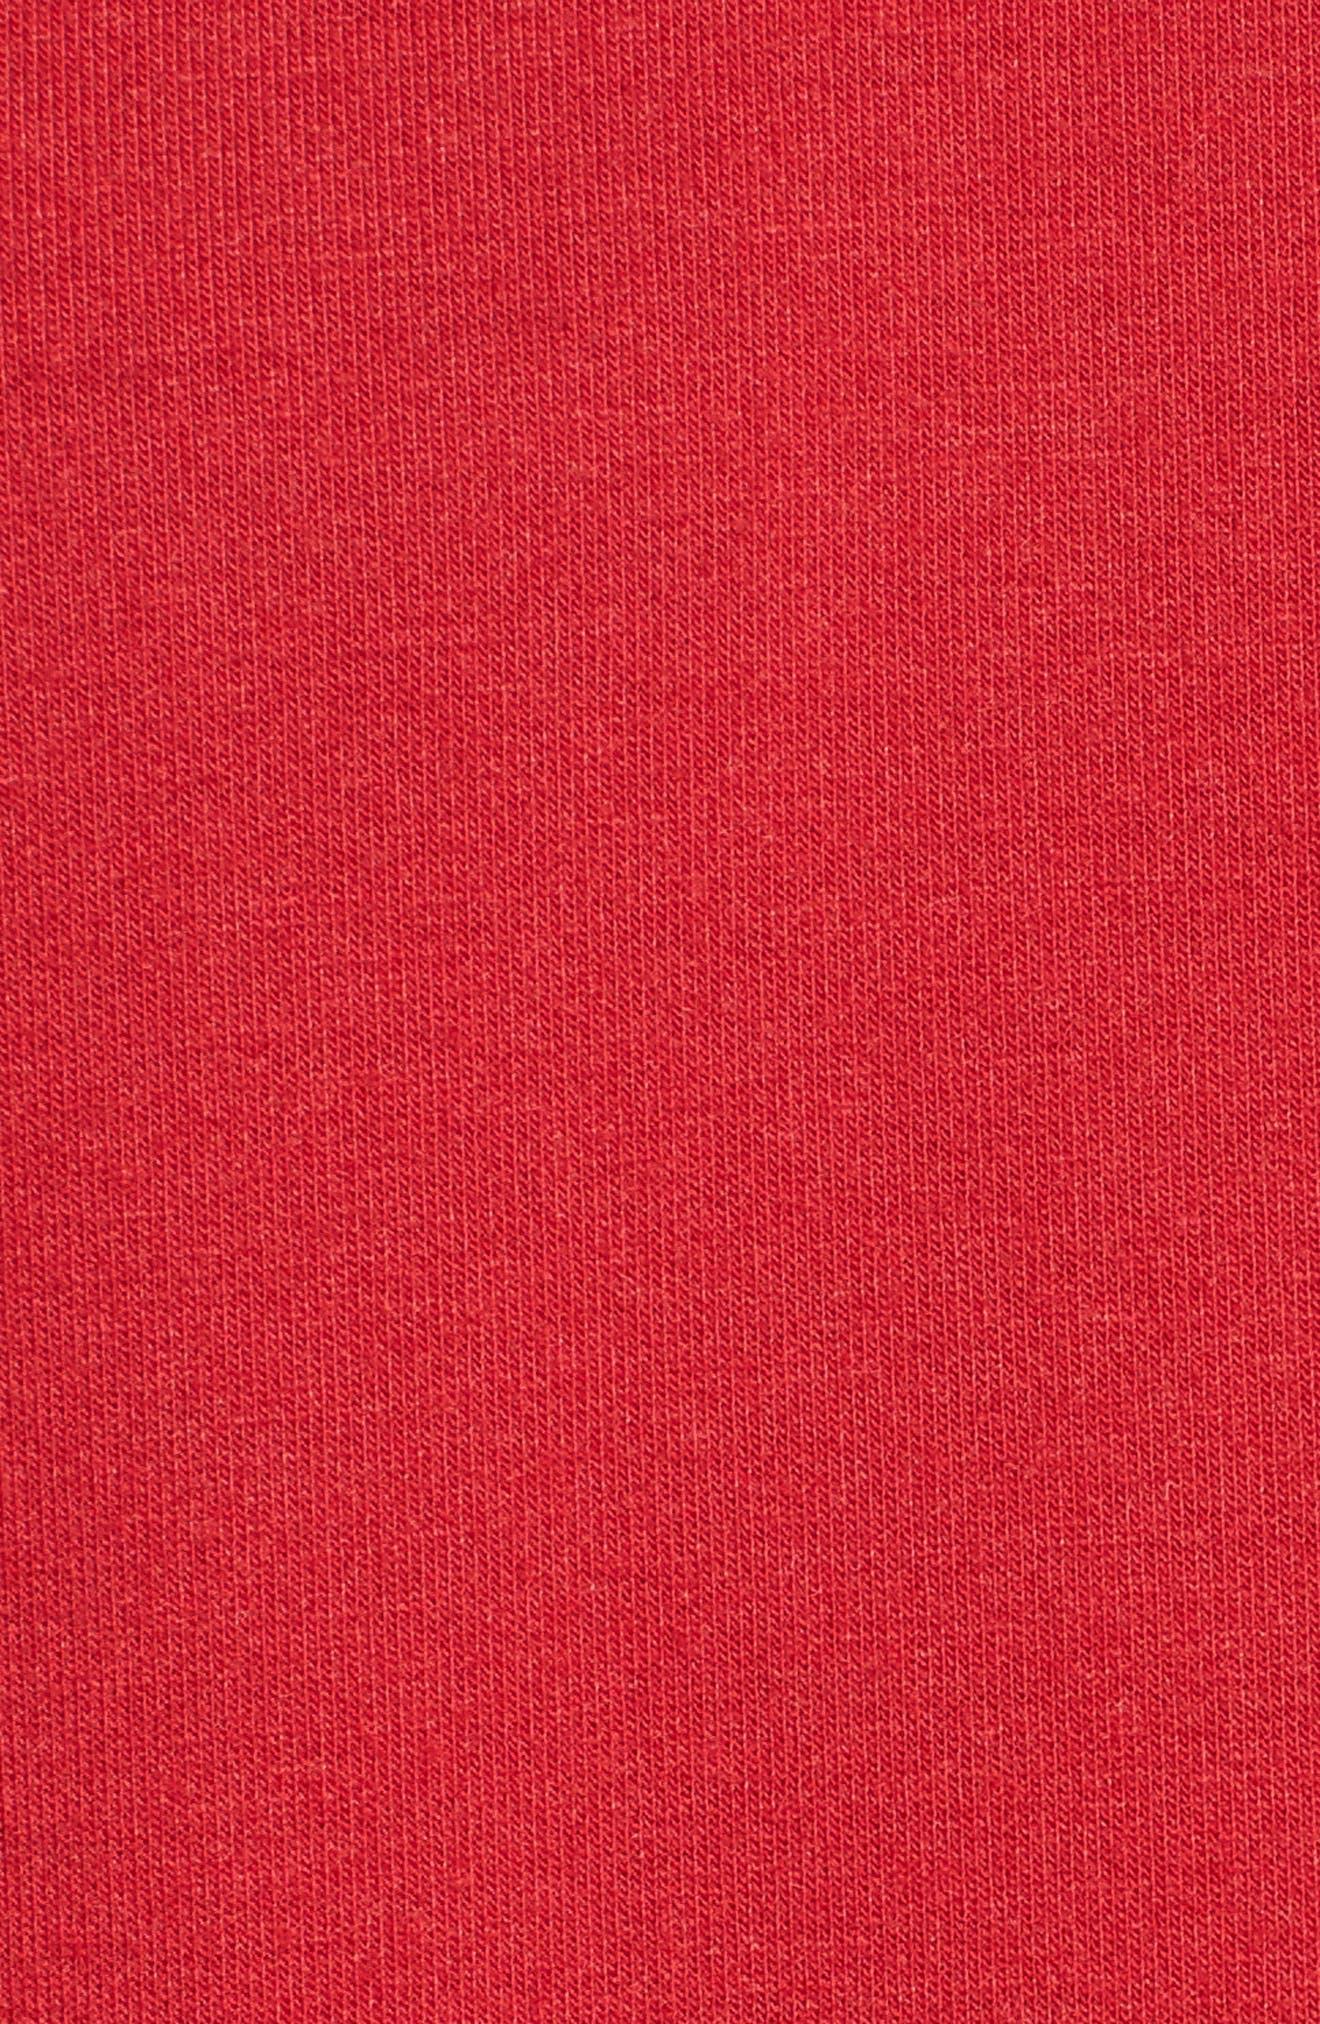 Cinch Sleeve Sweatshirt,                             Alternate thumbnail 5, color,                             603